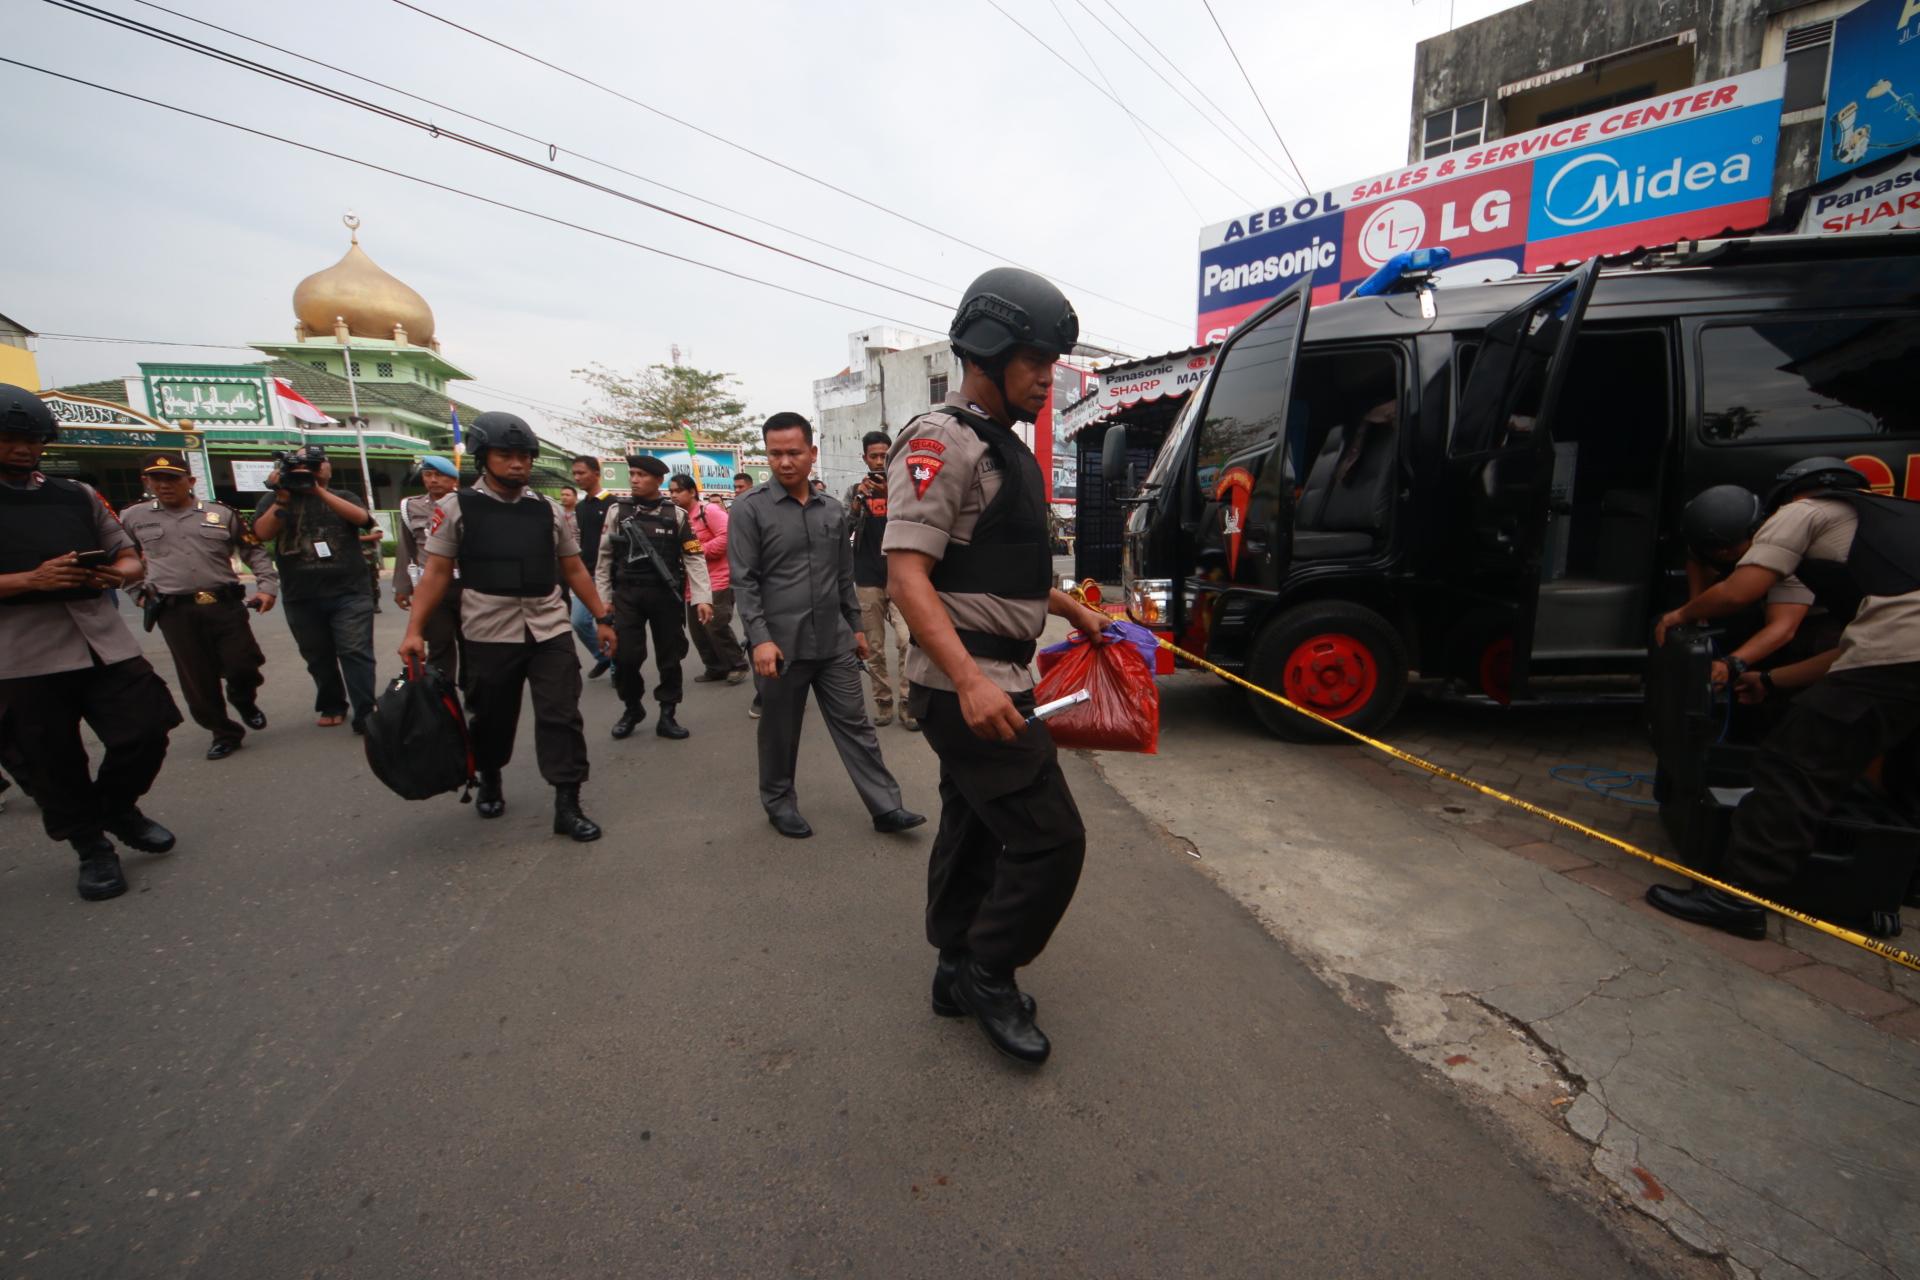 Polisi mengamankan plastik warna merah dan sebuah tas dari masjid. (Lampungnews/El Shinta)